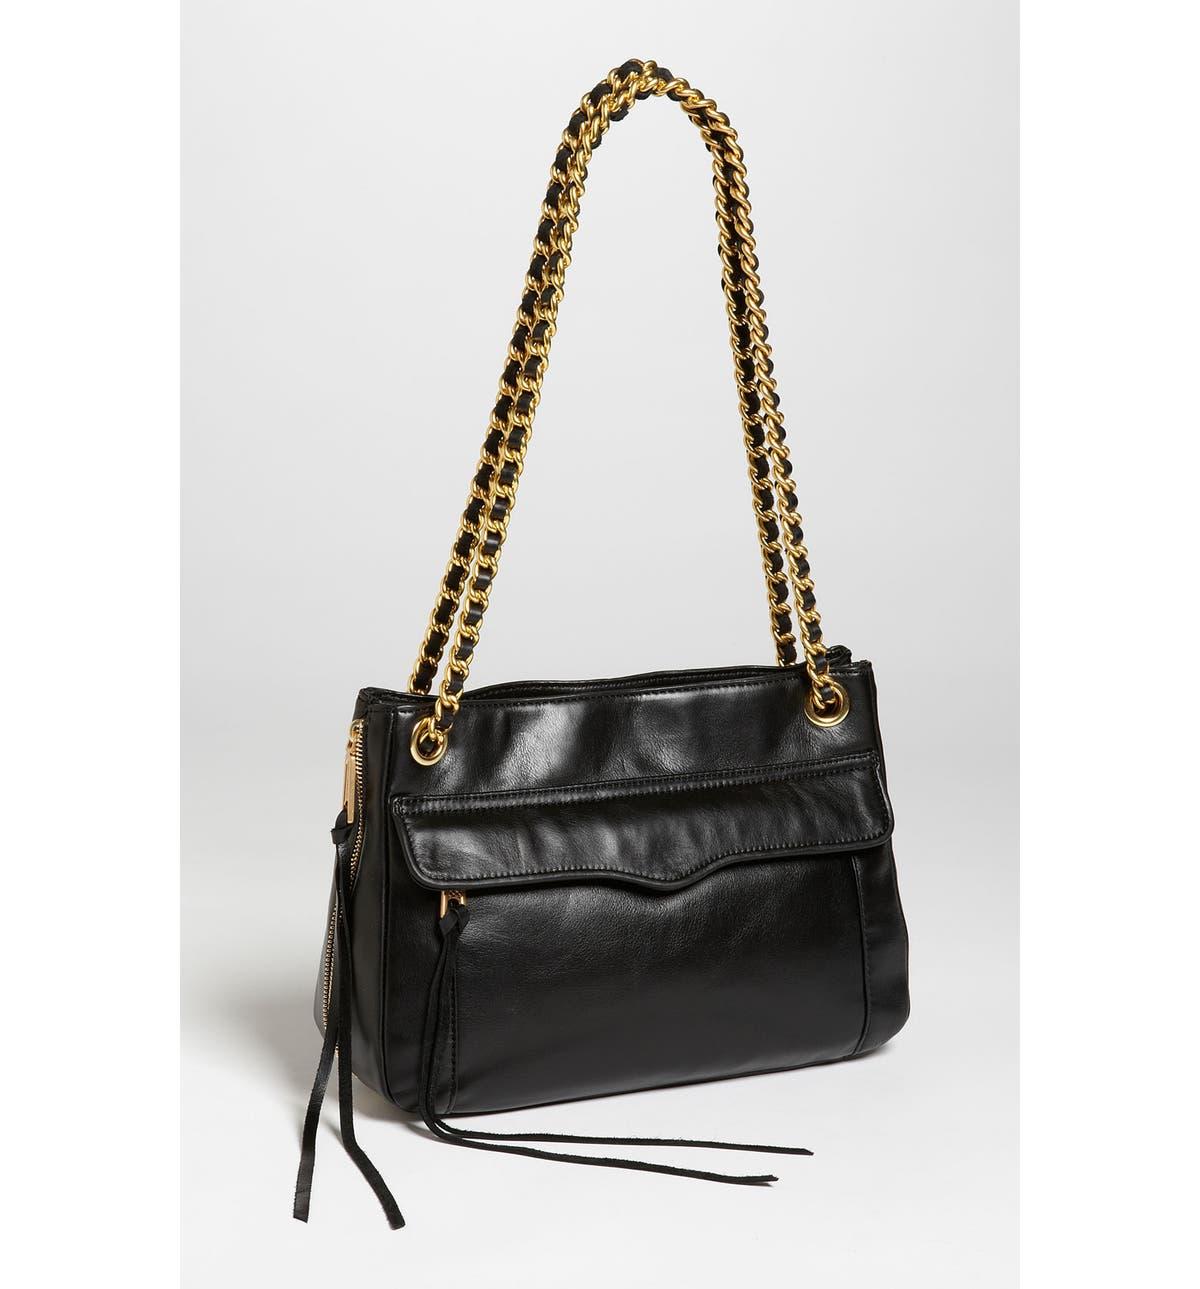 6c1b1c600a23 Rebecca Minkoff  Swing  Double Chain Shoulder Bag